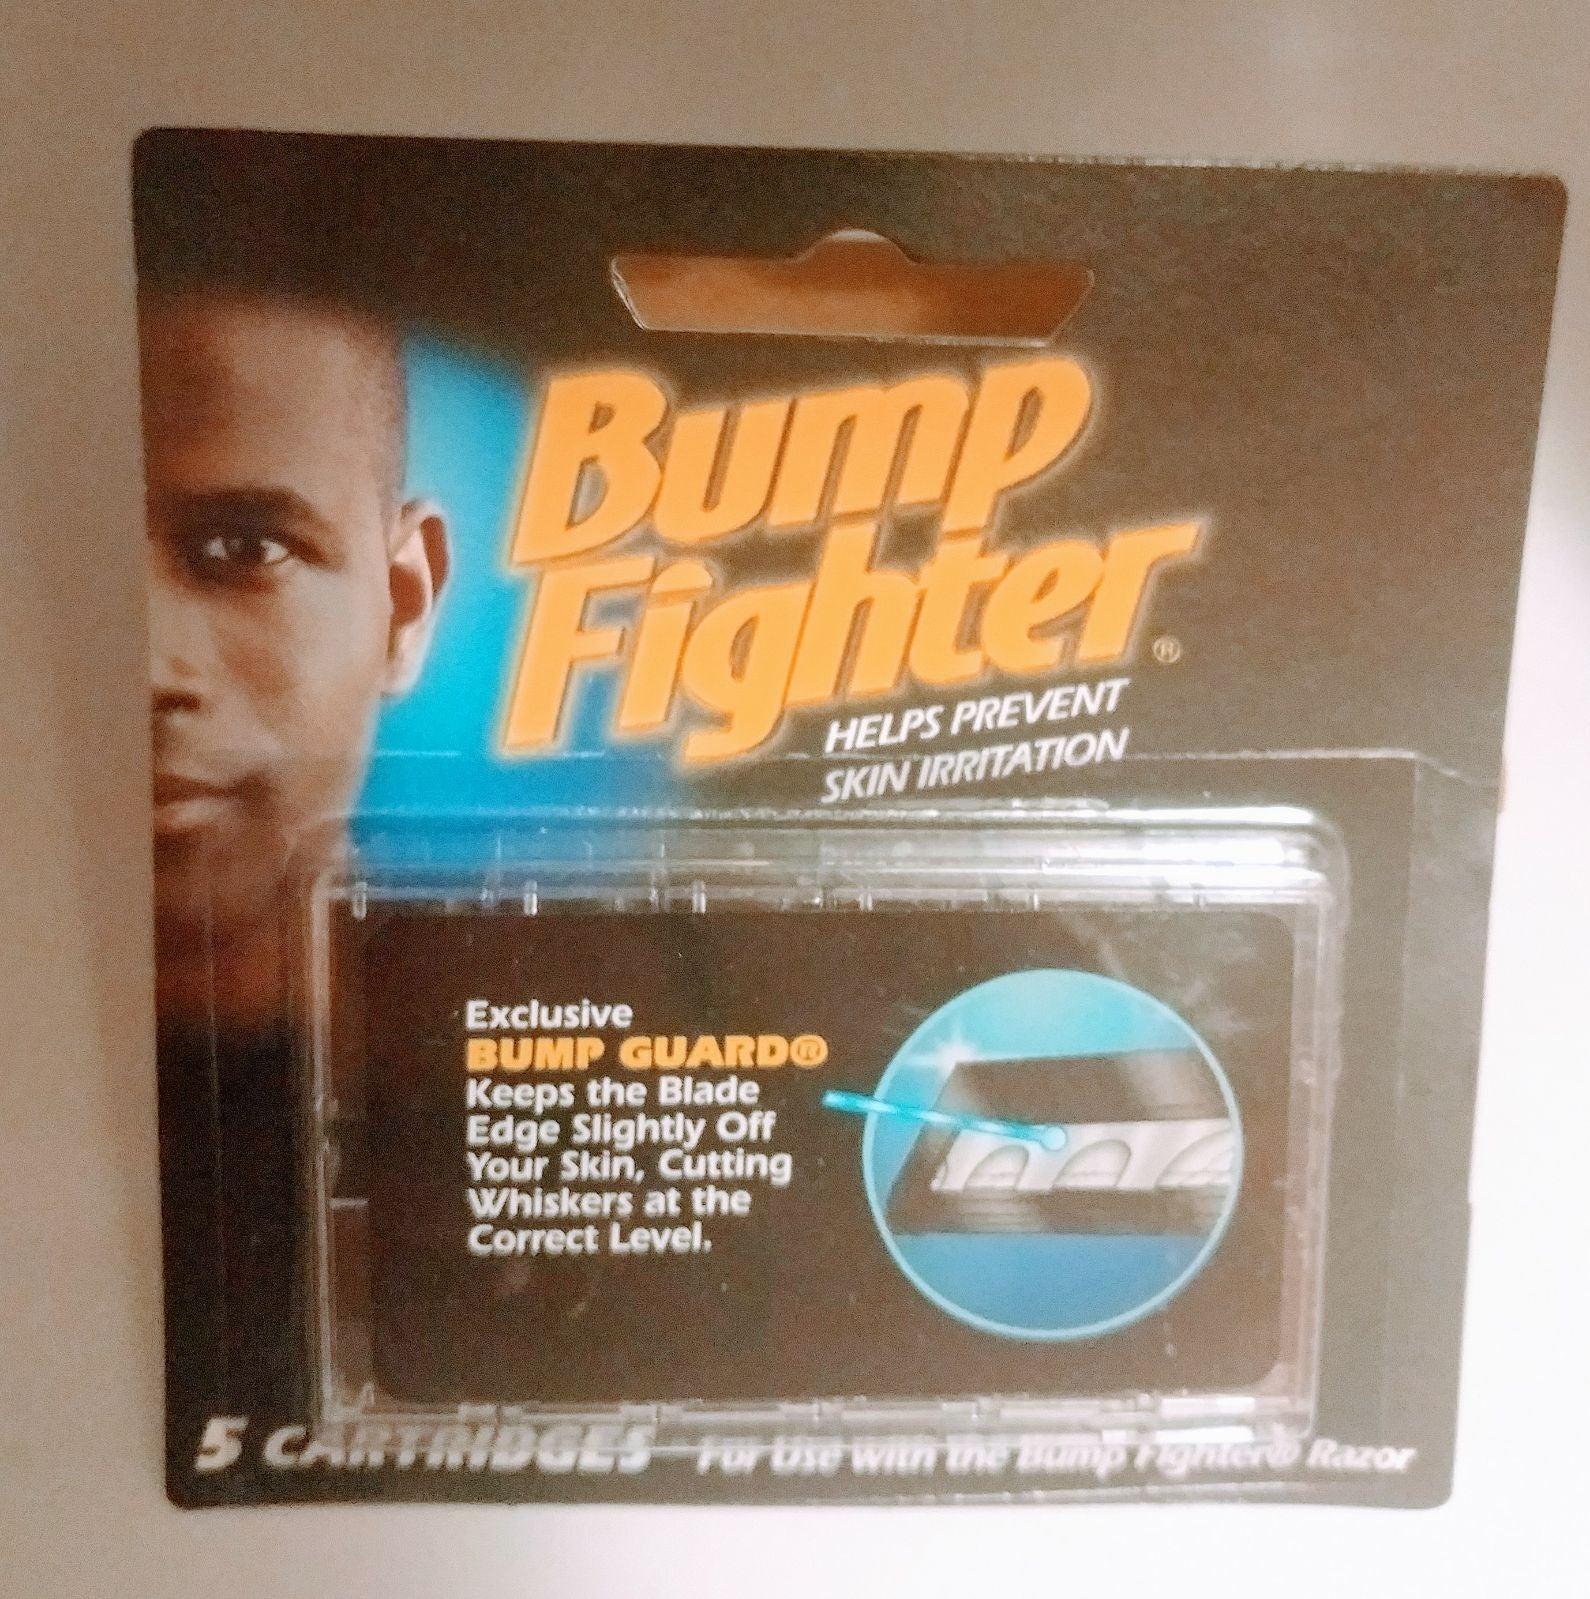 Lot of 3 'BUMP FIGHTER' 5 Cartridges pk